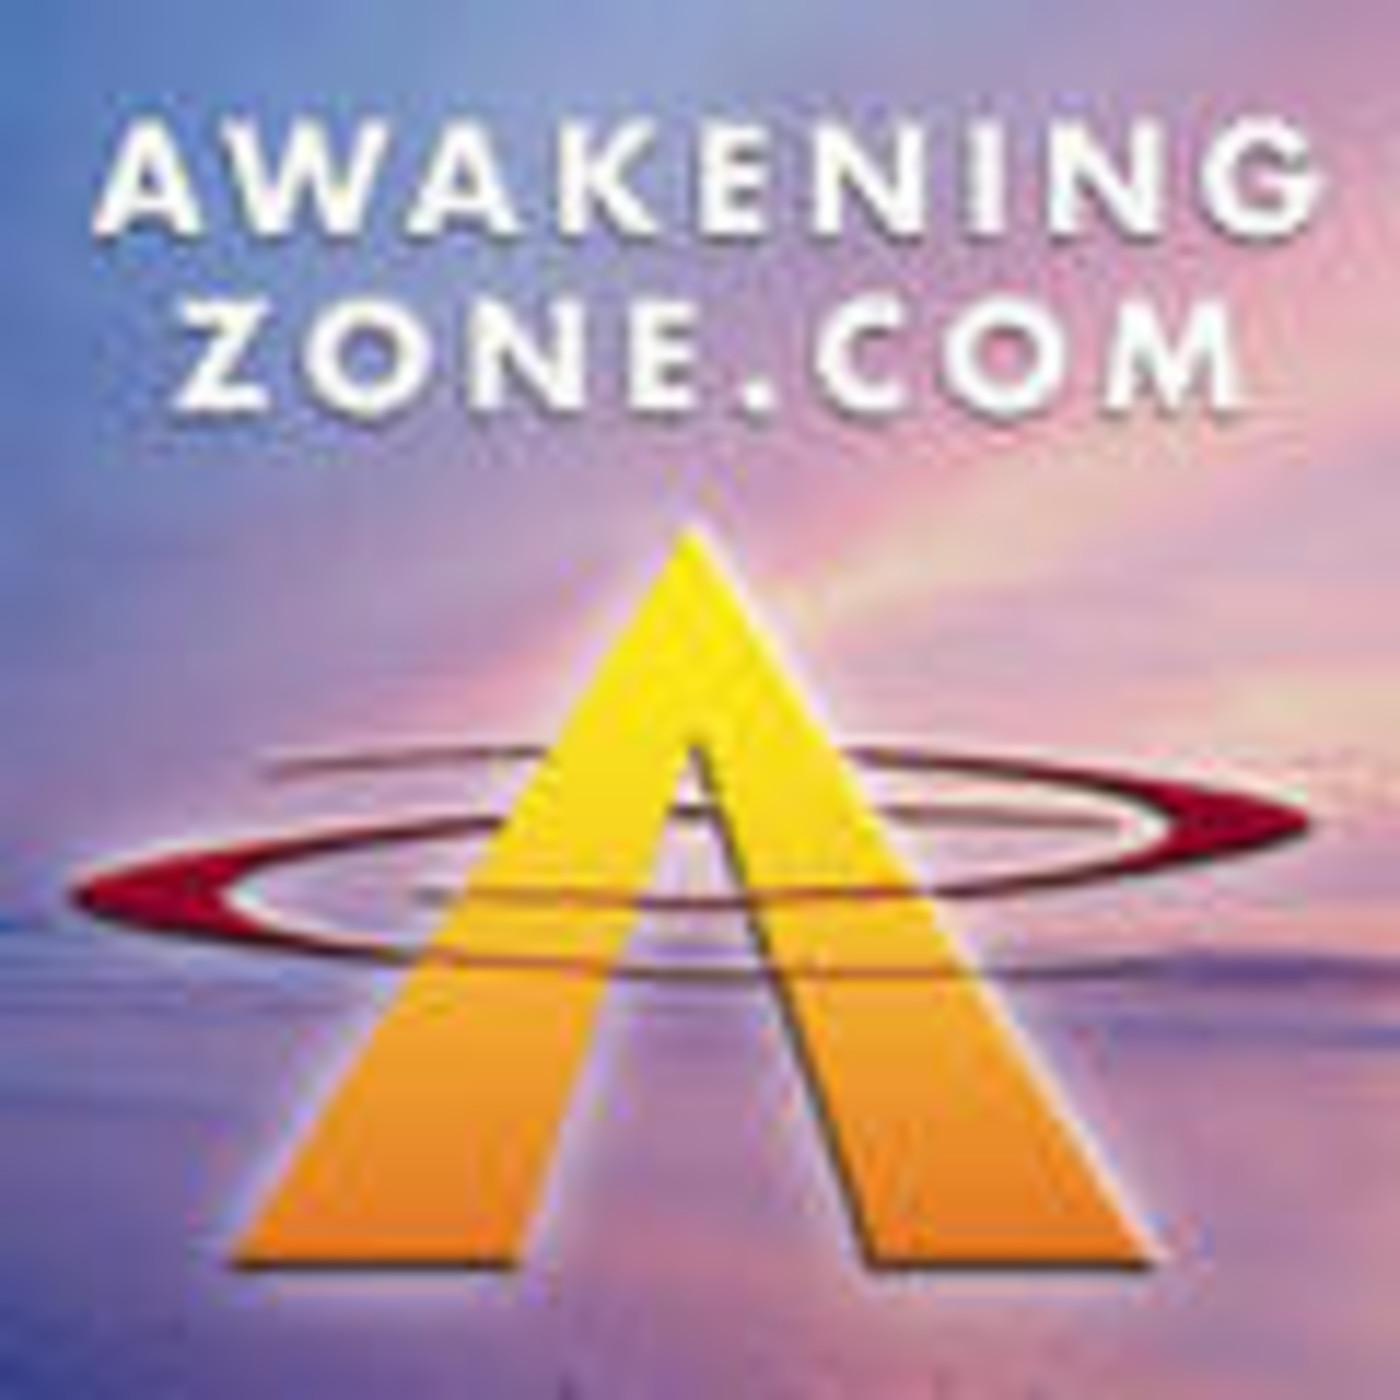 Your Spiritual Awakening Zone